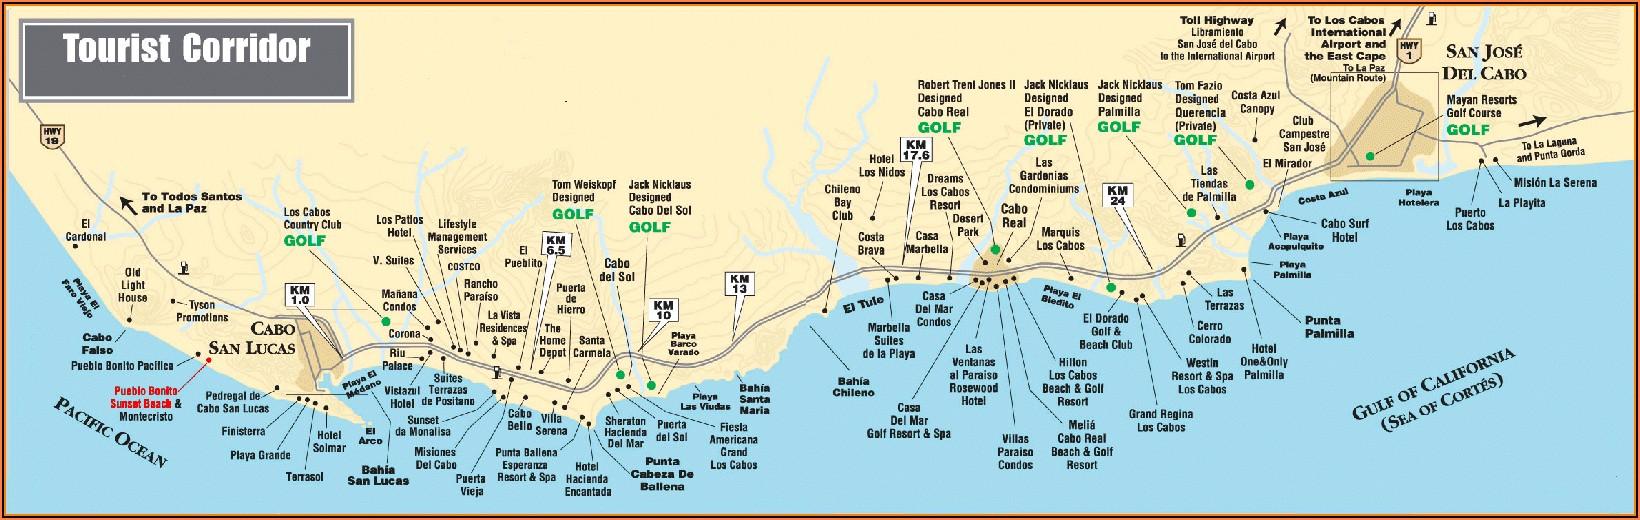 Los Cabos Hotels Map